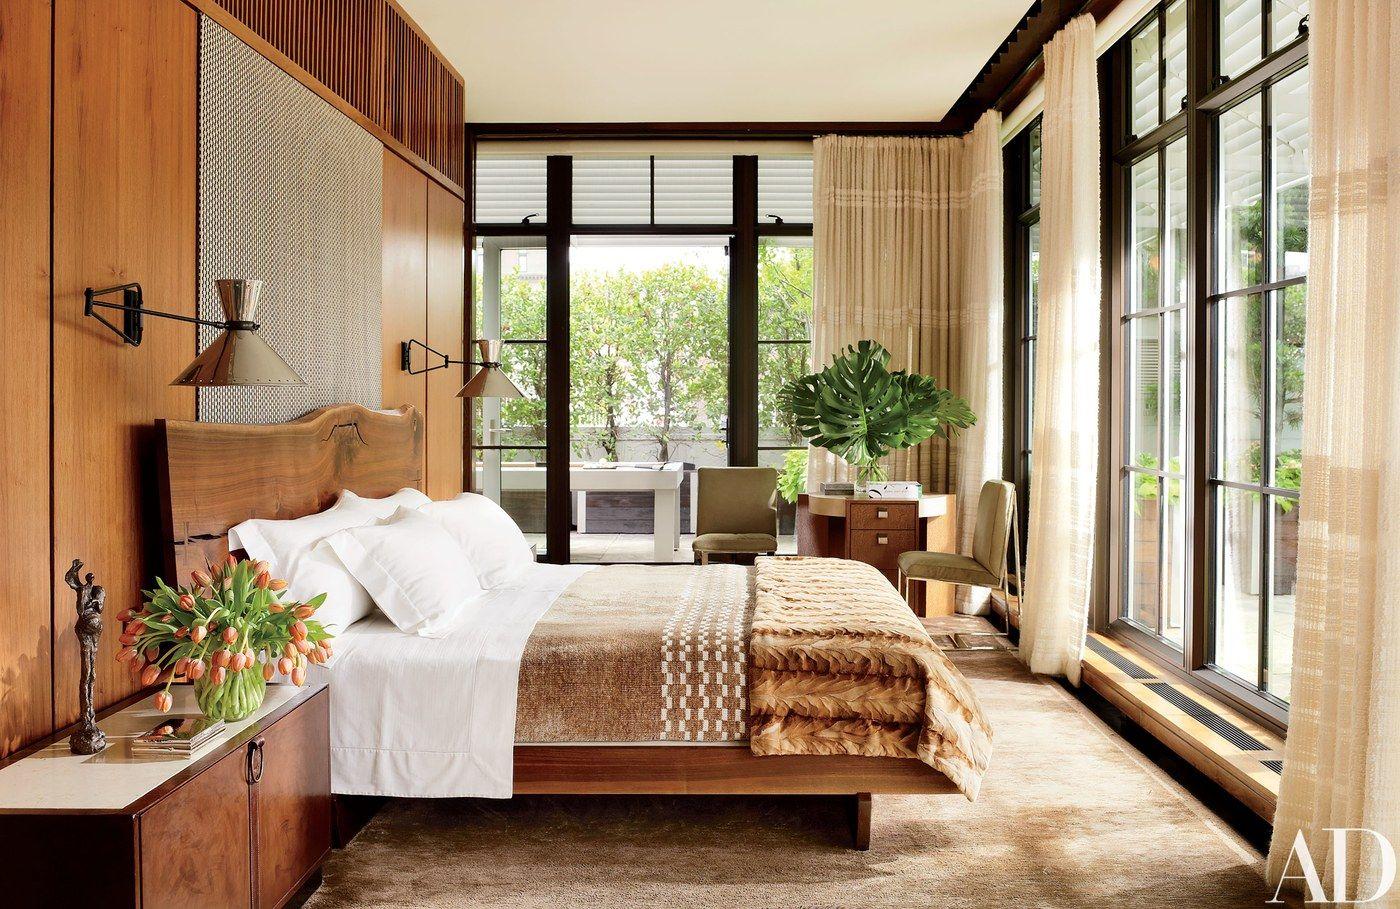 Explore Apartment Master Bedroom Bedroom Decor and